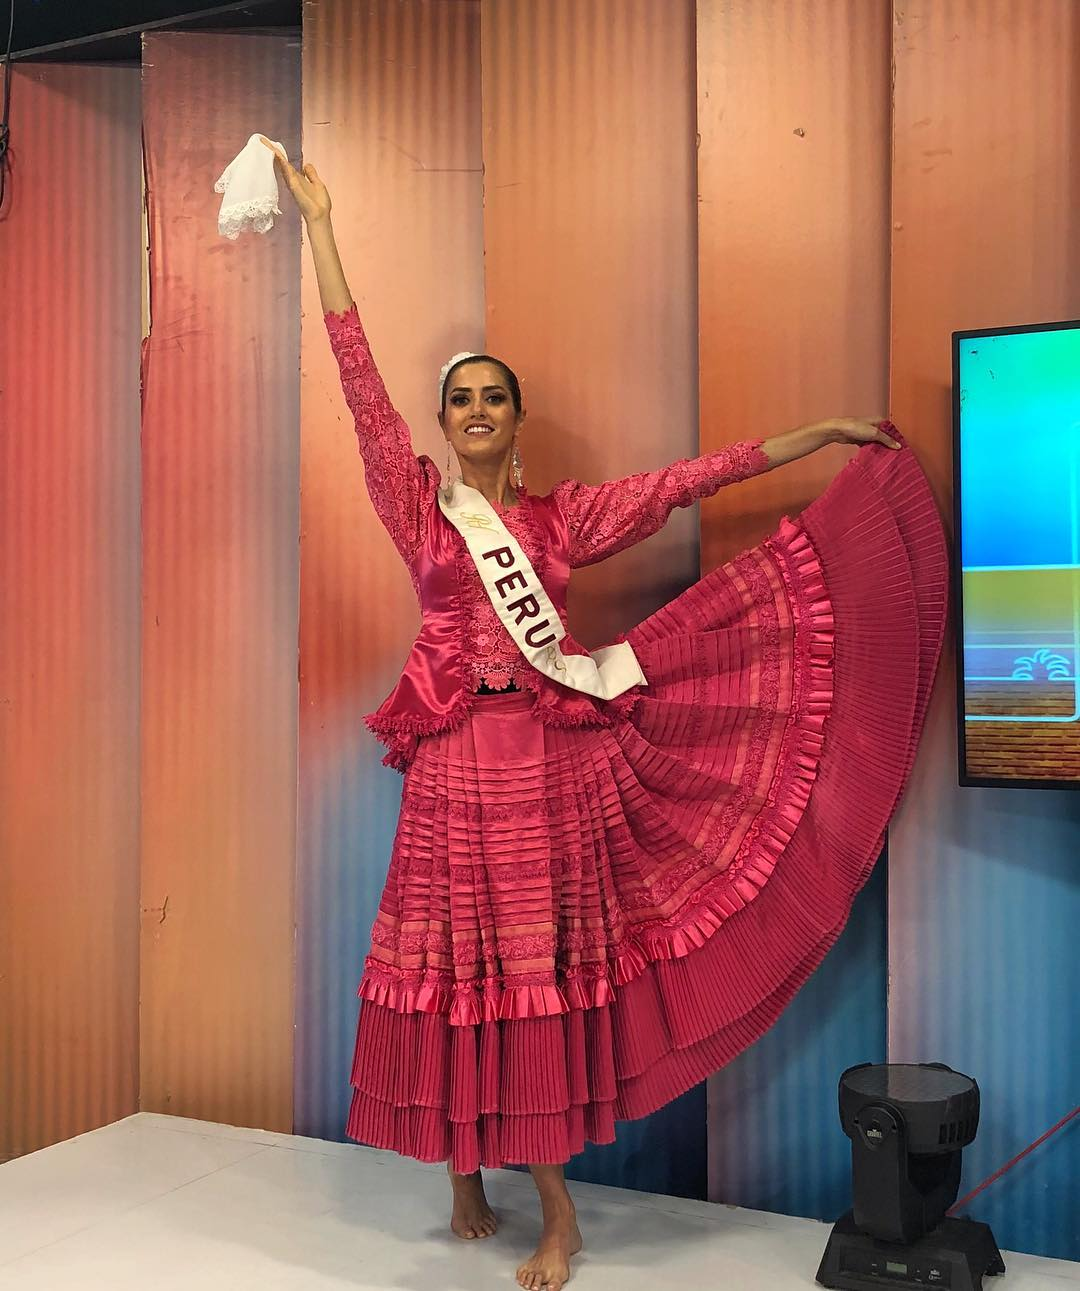 jessica mcfarlane, 7 finalista de reyna hispanoamericana 2018. - Página 4 44448110